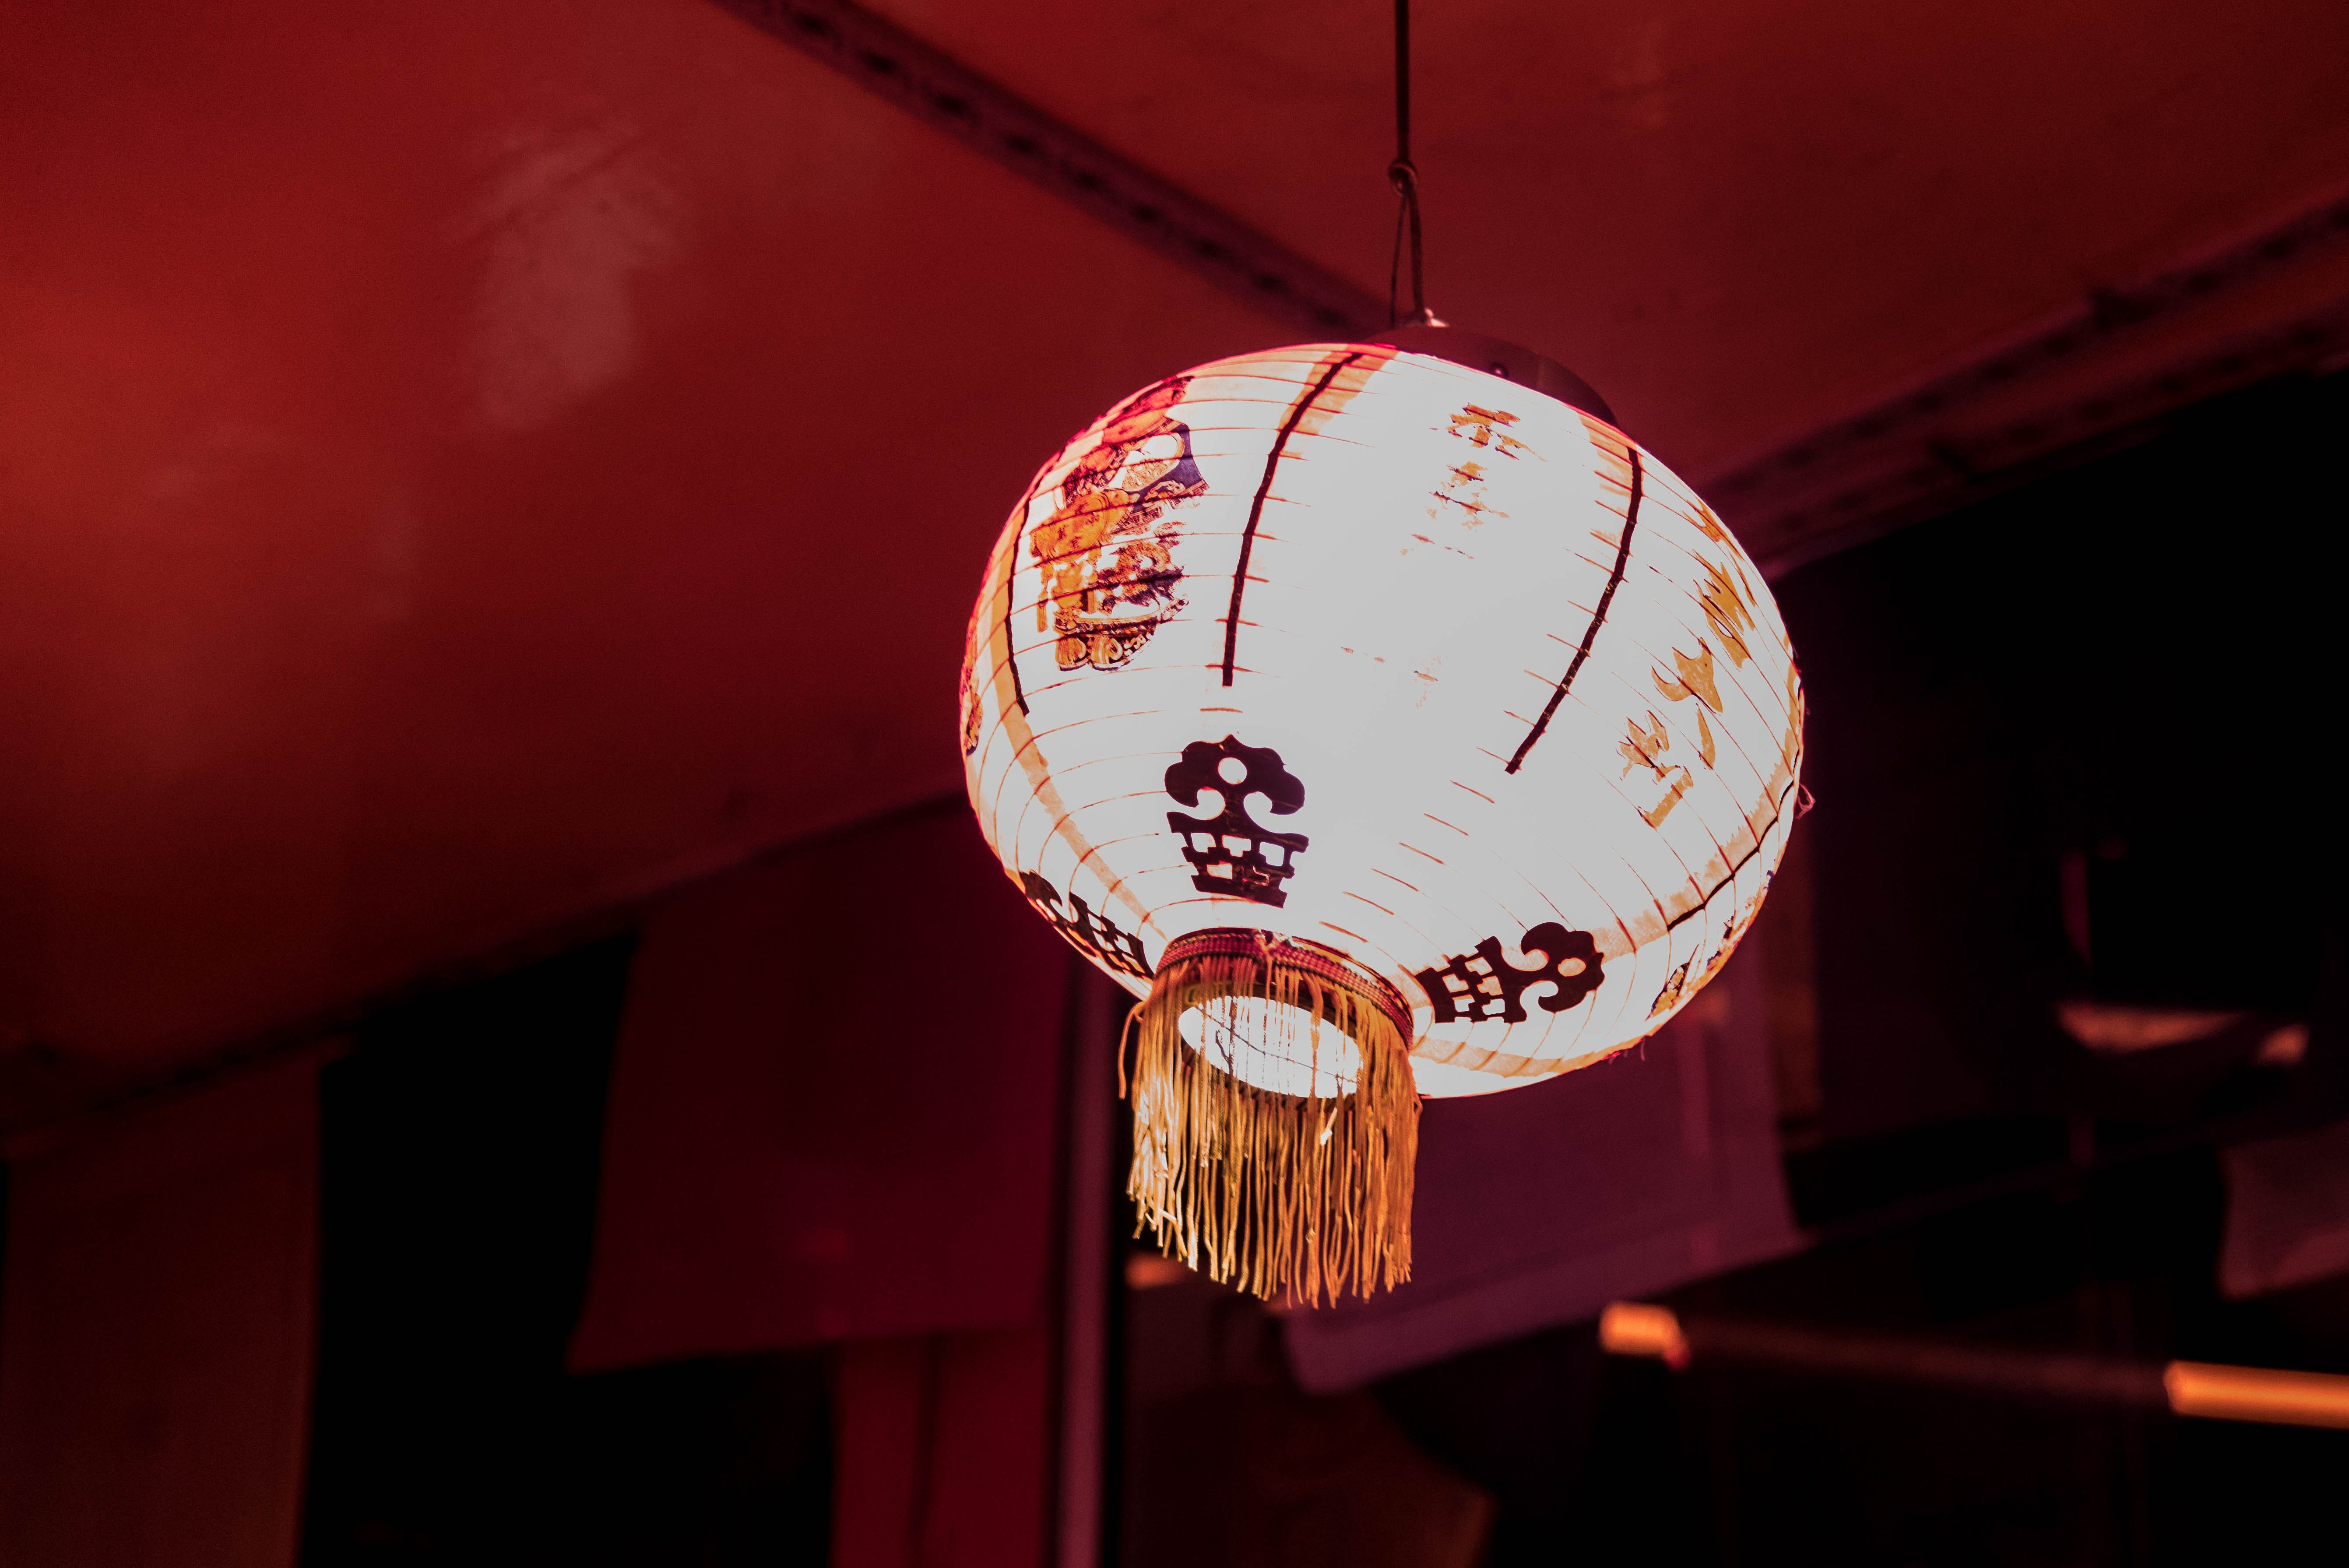 Free stock photo of Chinese, decor, light, red lantern